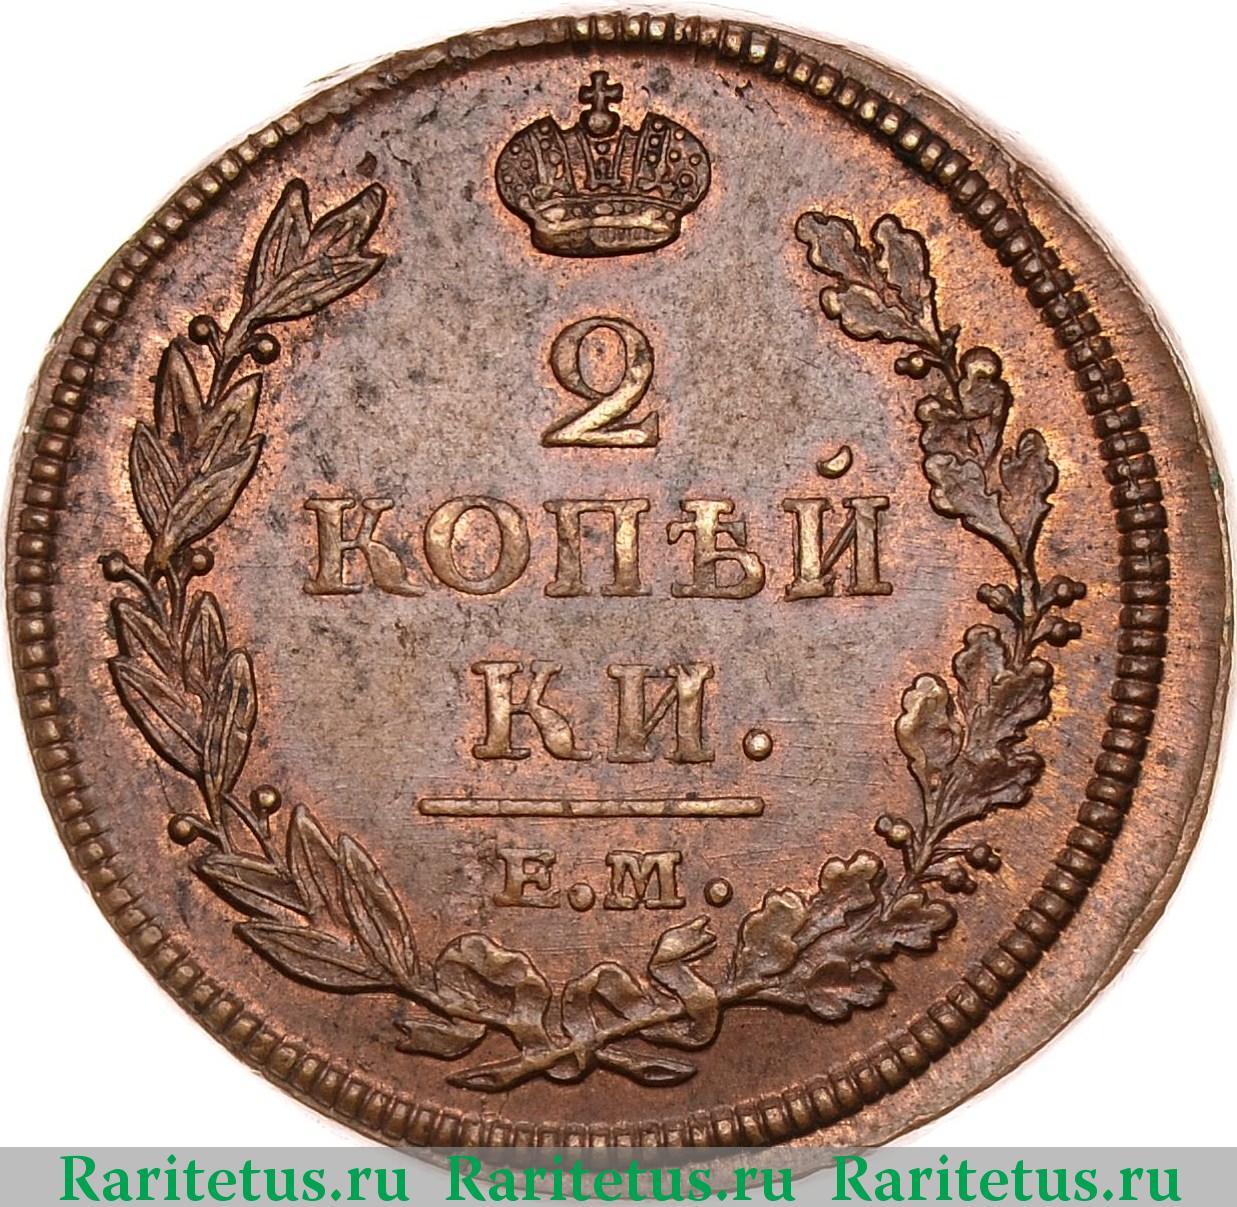 Монета 1810 10 рублевая монета 2011 года спмд